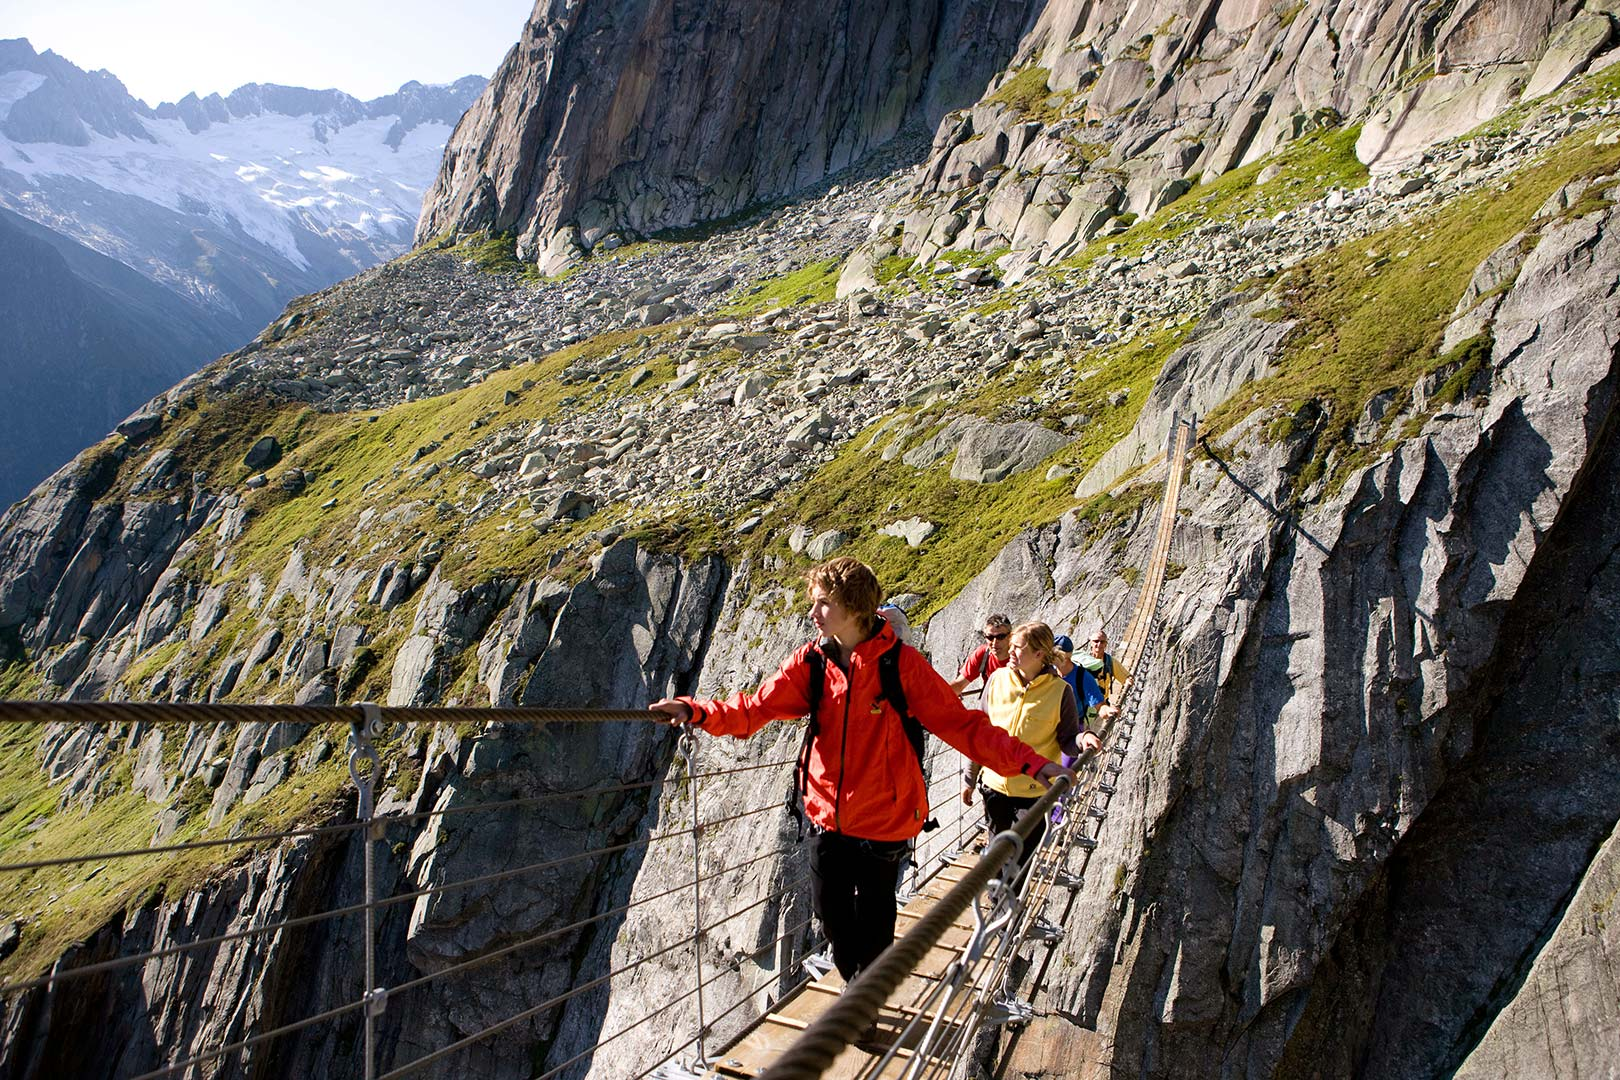 Picture of hikers crossing the Göscheneralp Salbitbrücke suspension bridge, Canton Uri, Switzerland